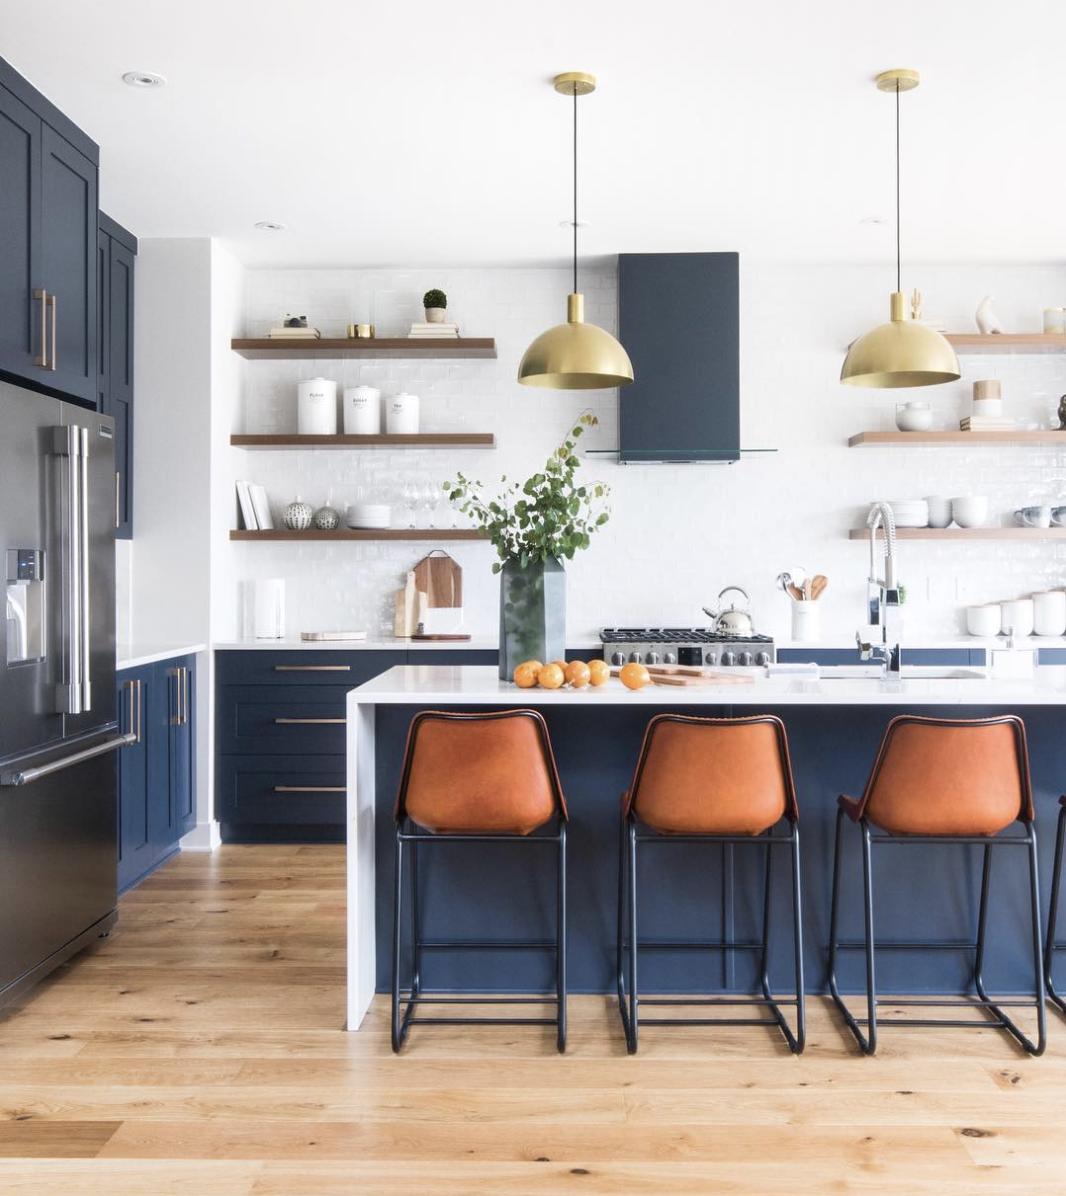 9 Key Kitchen Styling Tips from Ottawa Interior Design Firm ...